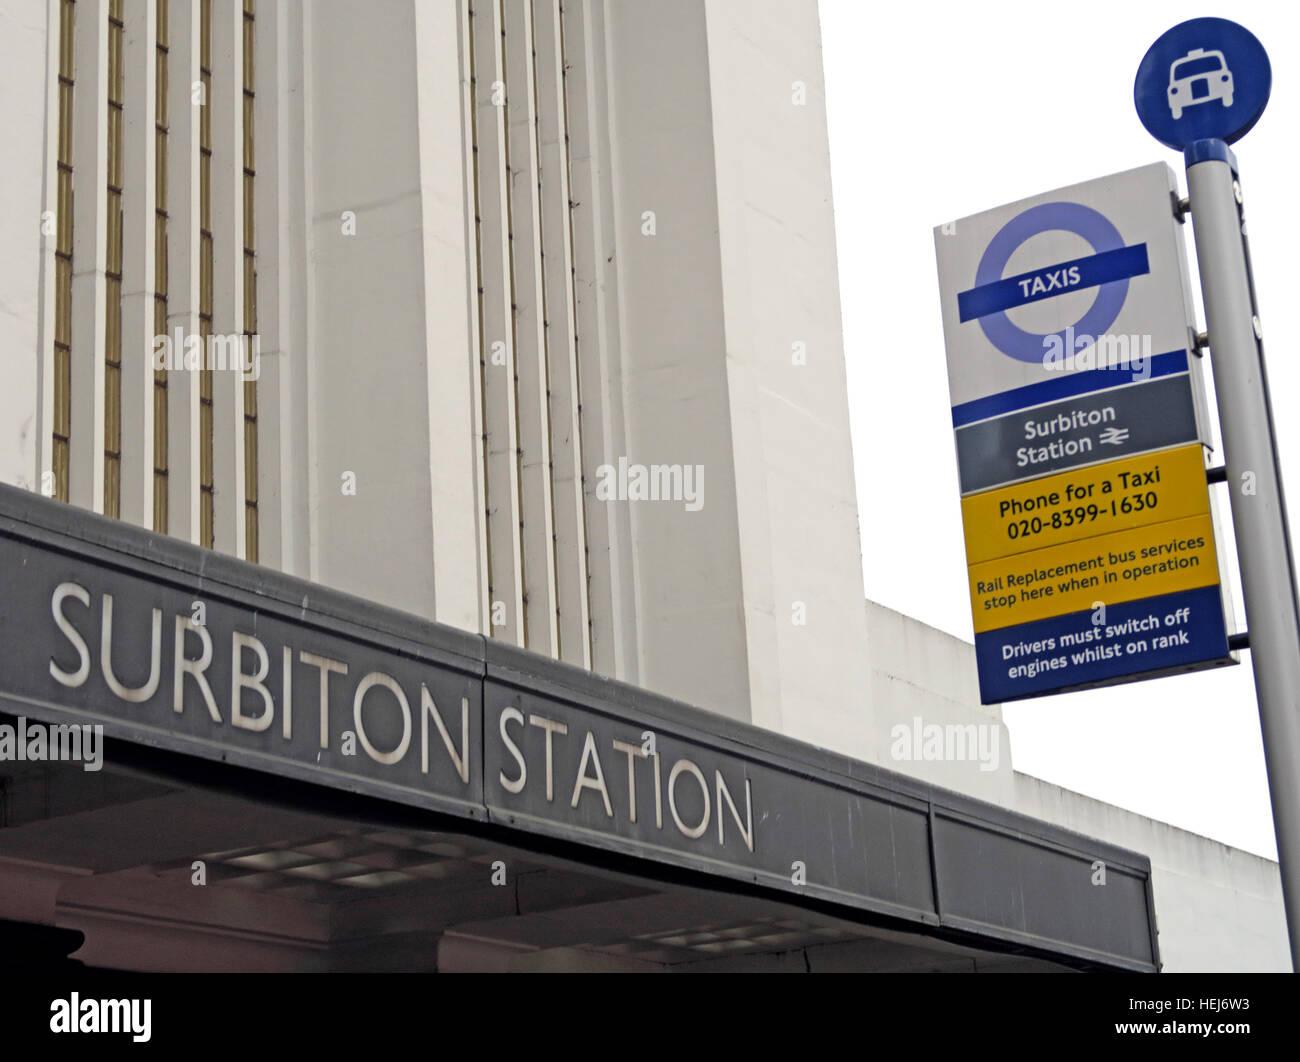 Hipster,art,deco,artdeco,art-deco,Surbiton,Railway Station,SW Trains,West London,England,UK,building,architecture,within M25,within,M25,taxi,Uber,bus,transport,links,transit,Surbiton Station,GoTonySmith,@HotpixUK,Tony,Smith,UK,GB,Great,Britain,United,Kingdom,English,British,England,London,Greater,problem,with,problem with,issue with,LDN,City,Centre,cities,Urban,Urbanist,town,infrastructure,transport,tour,tourism,tourists,urban,attraction,attractions,Buy Pictures of,Buy Images Of,Images of,Stock Images,Tony Smith,United Kingdom,Great Britain,Greater London,British Isles,City Centre